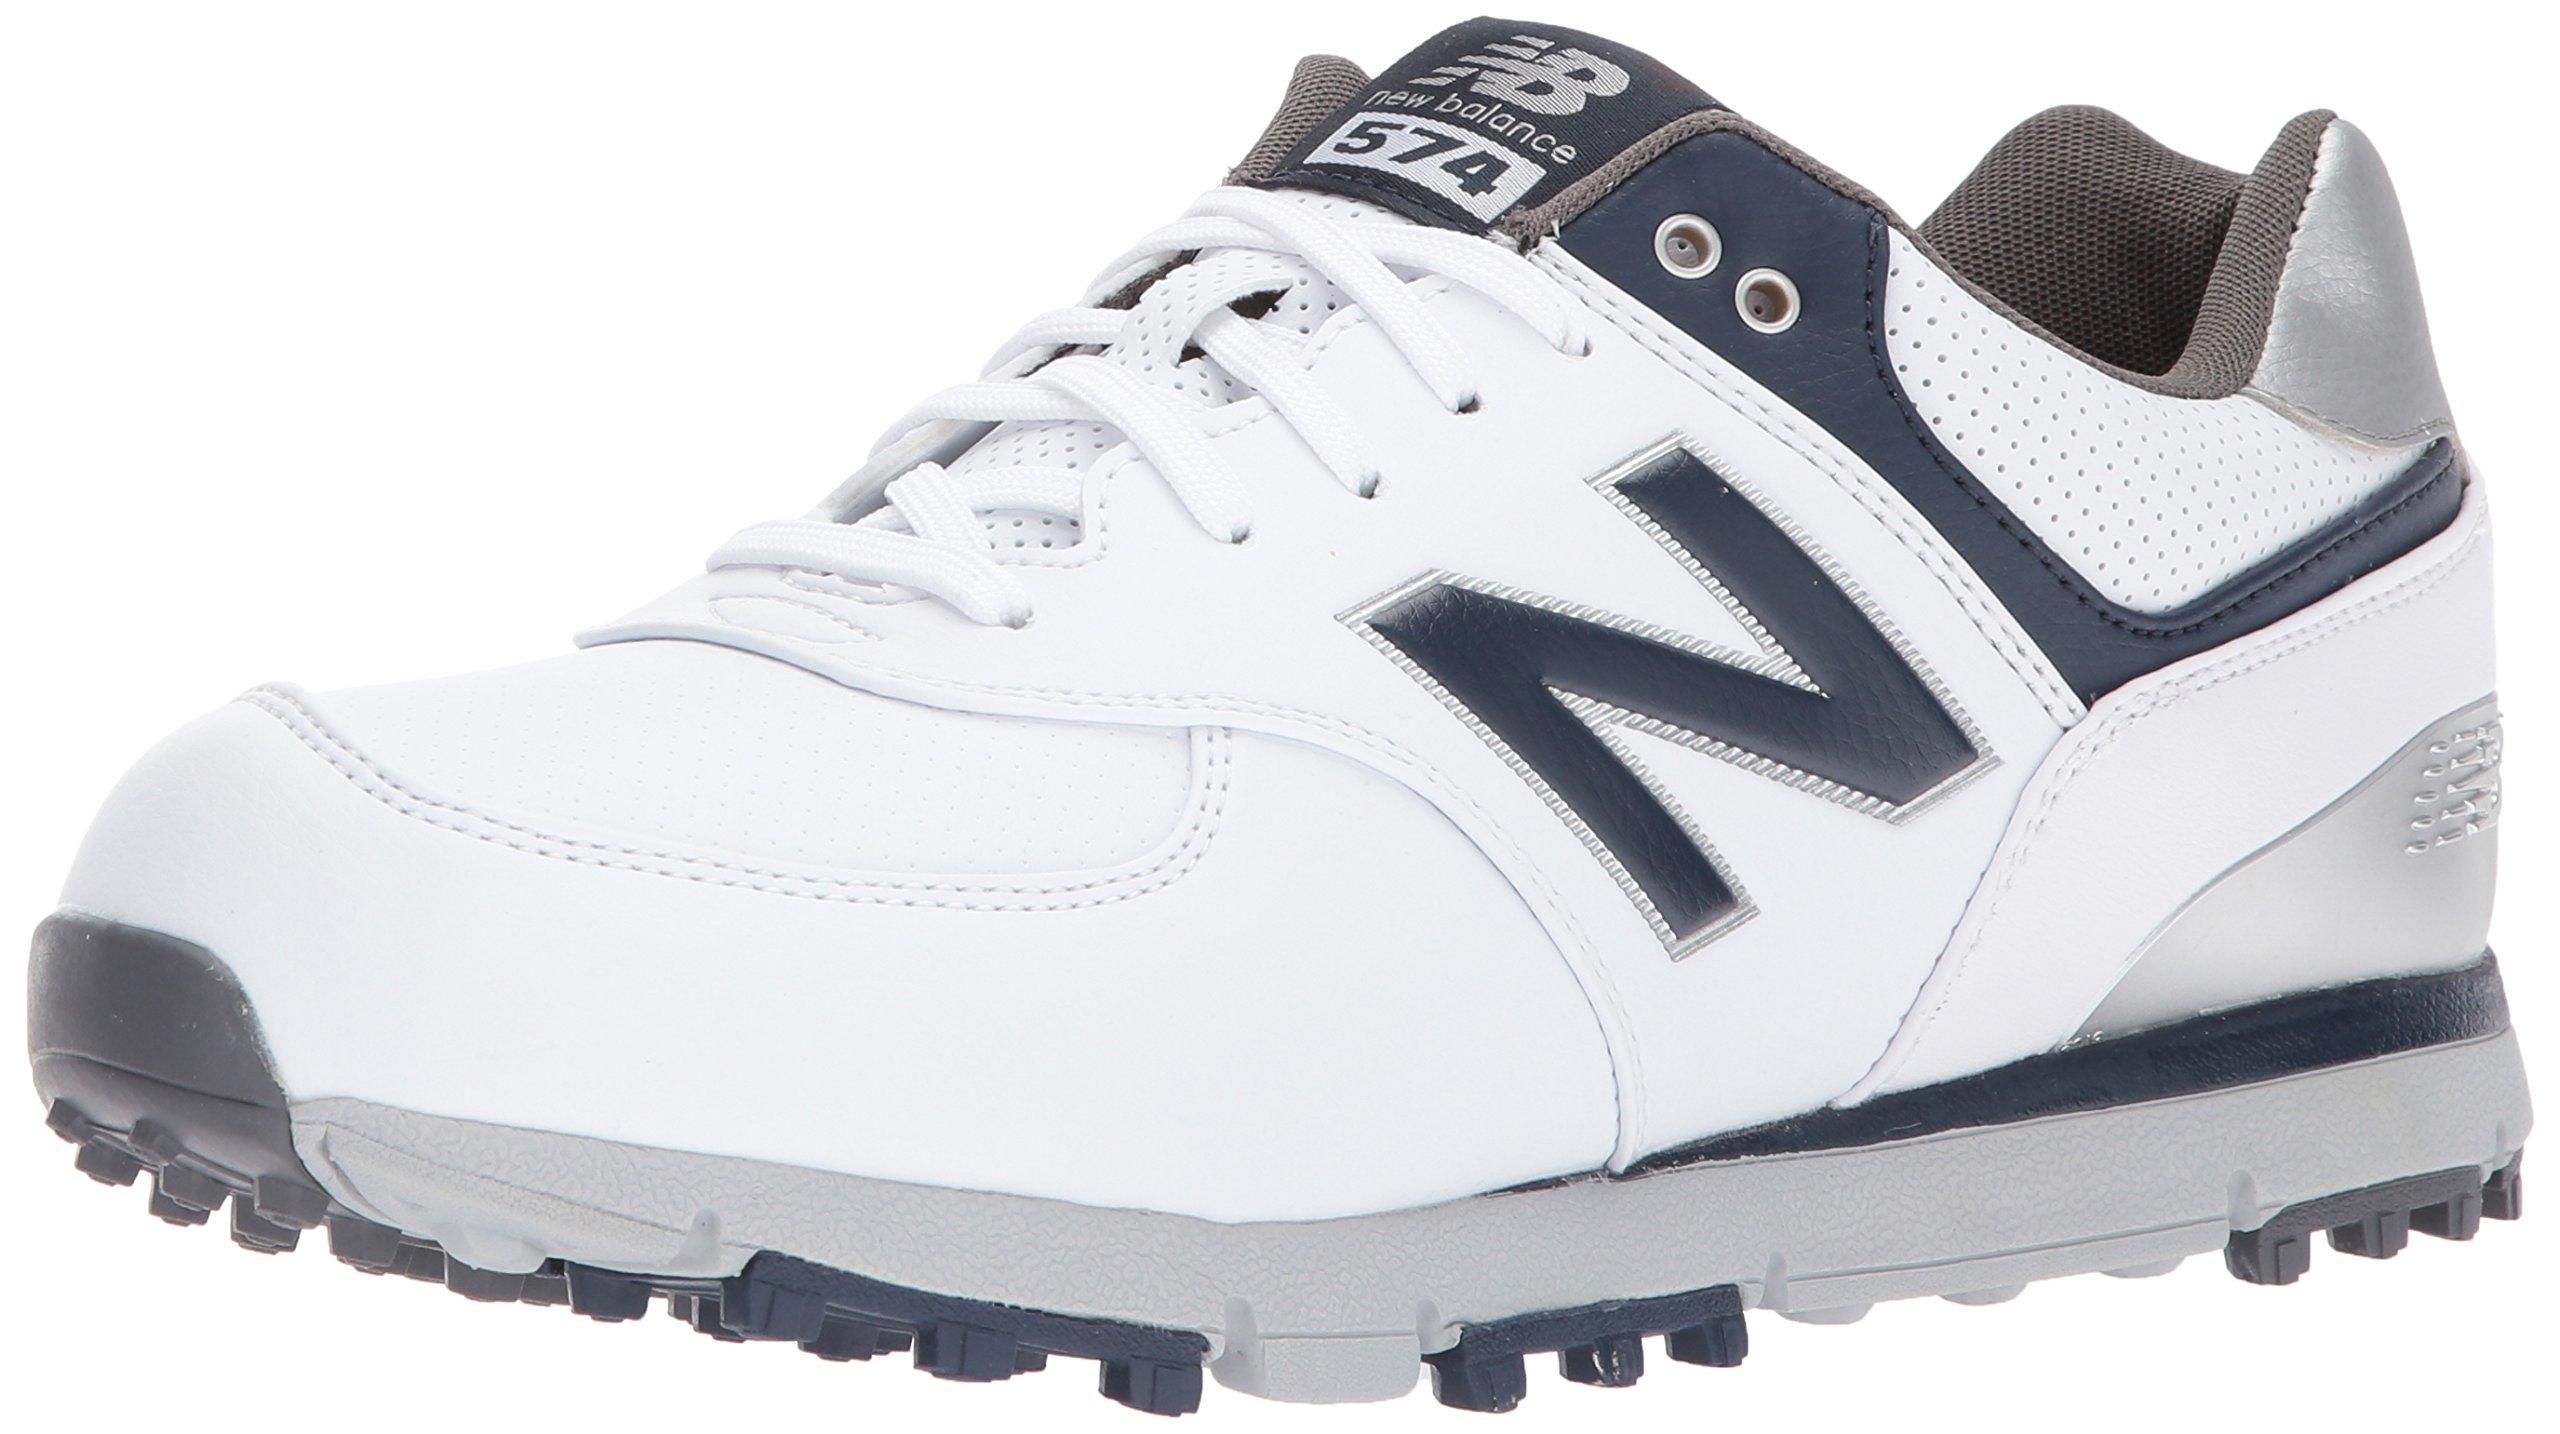 New Balance Men's 574 SL Golf Shoe, White/Navy, 11 2E 2E US by New Balance